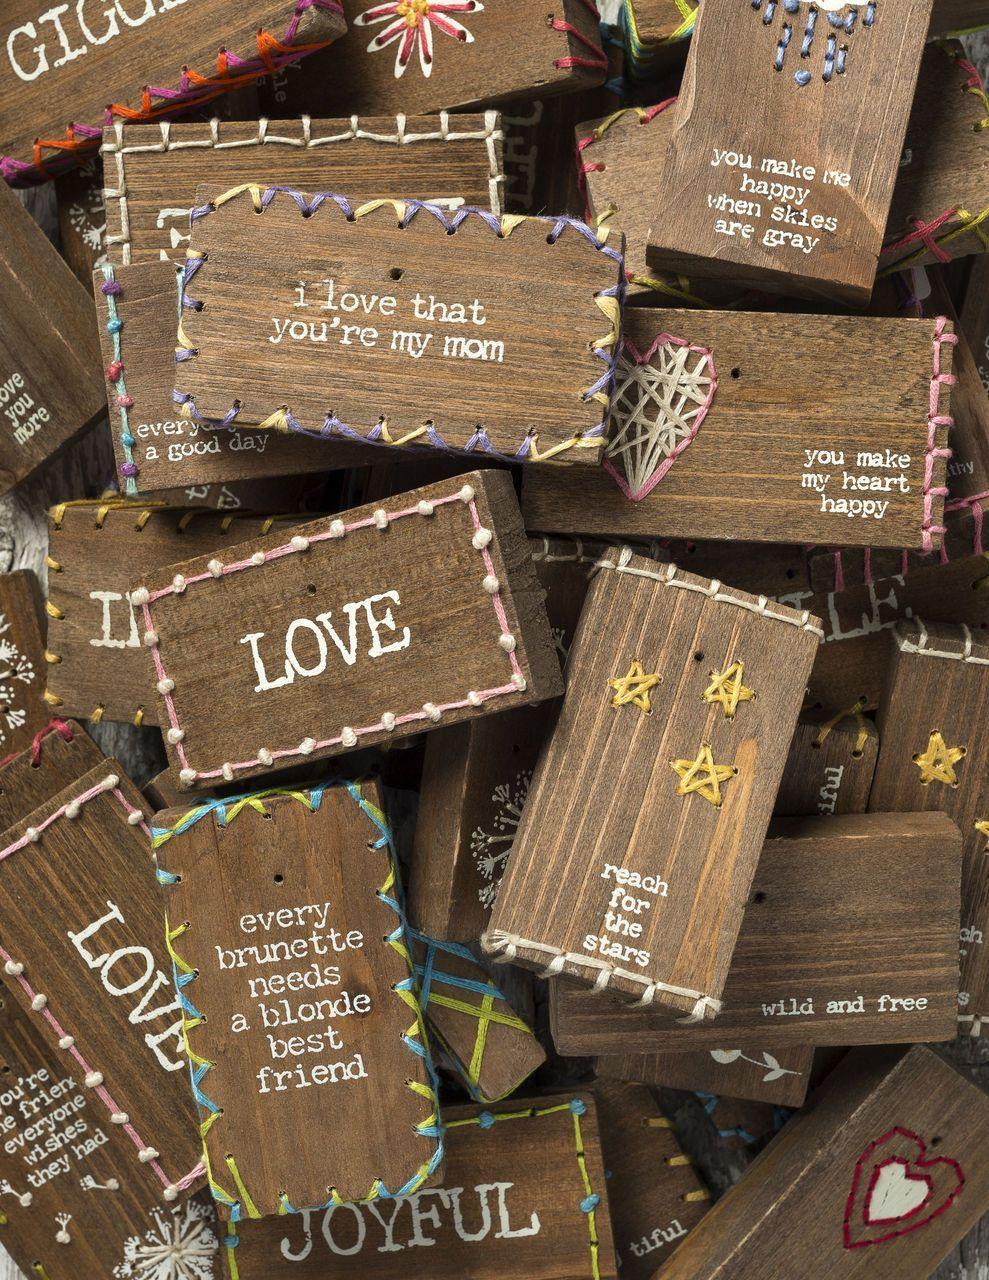 Details about Stitched Block Wood Primitives By